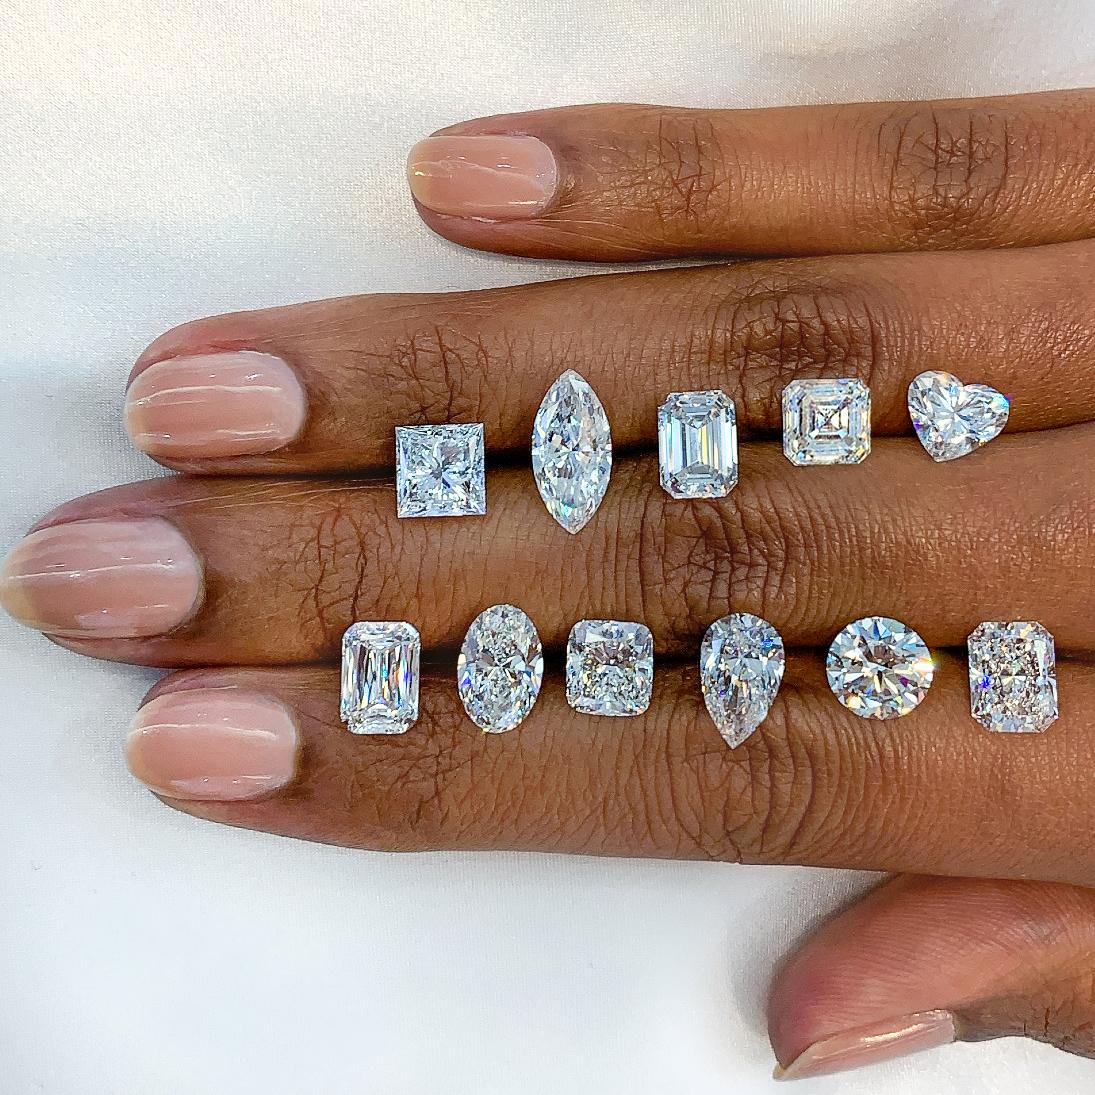 How to Choose a Diamond Shape: Comparing Popular Diamond Shapes